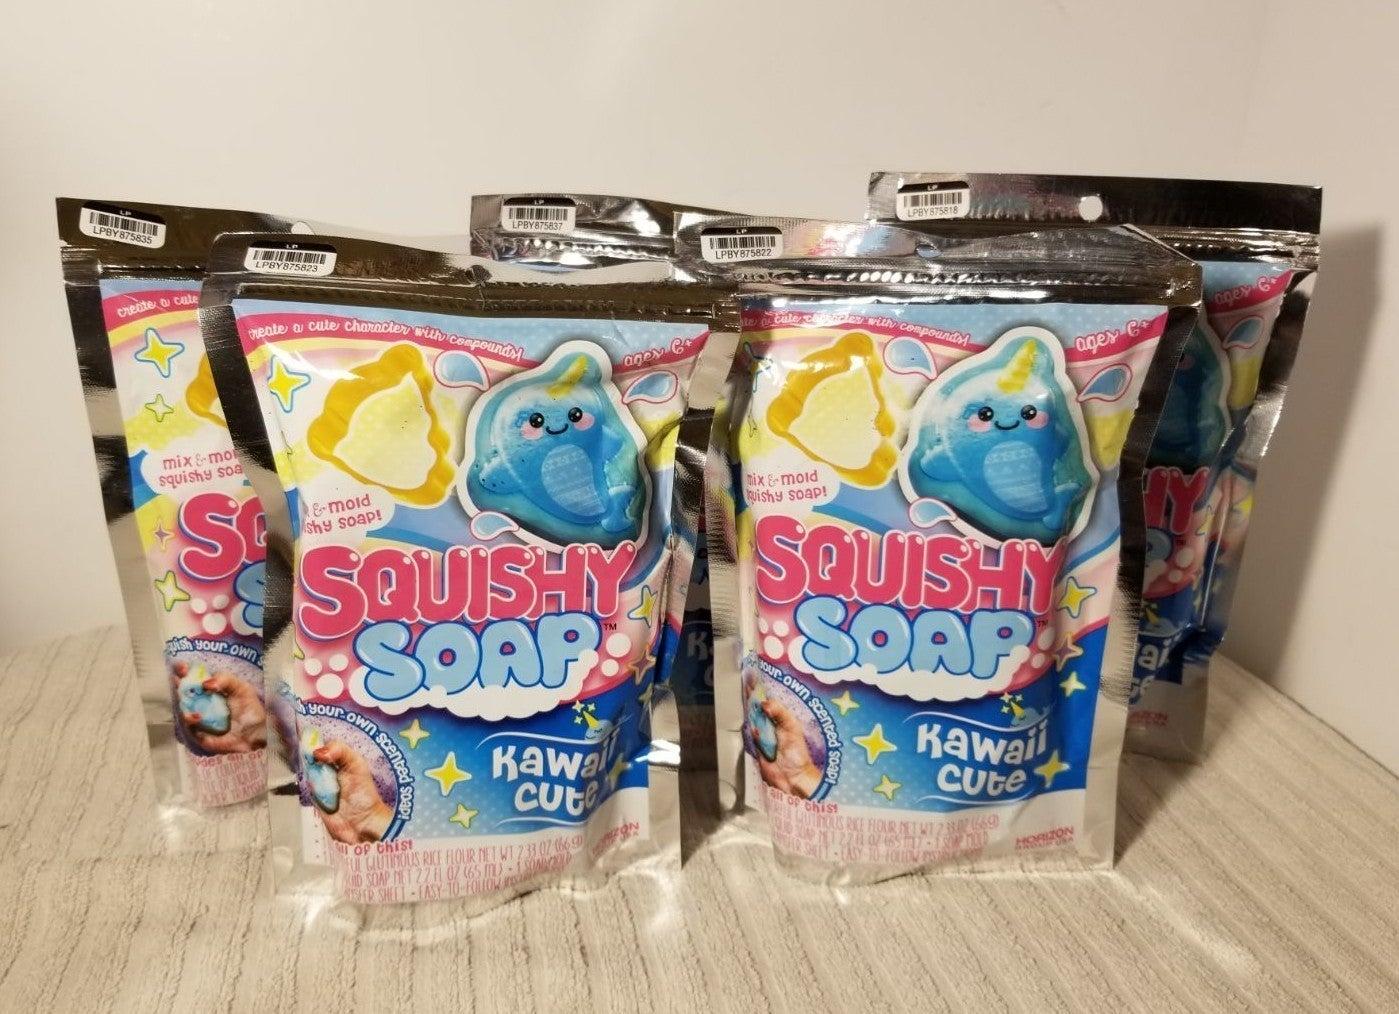 Squishy soap kawaii cute lot